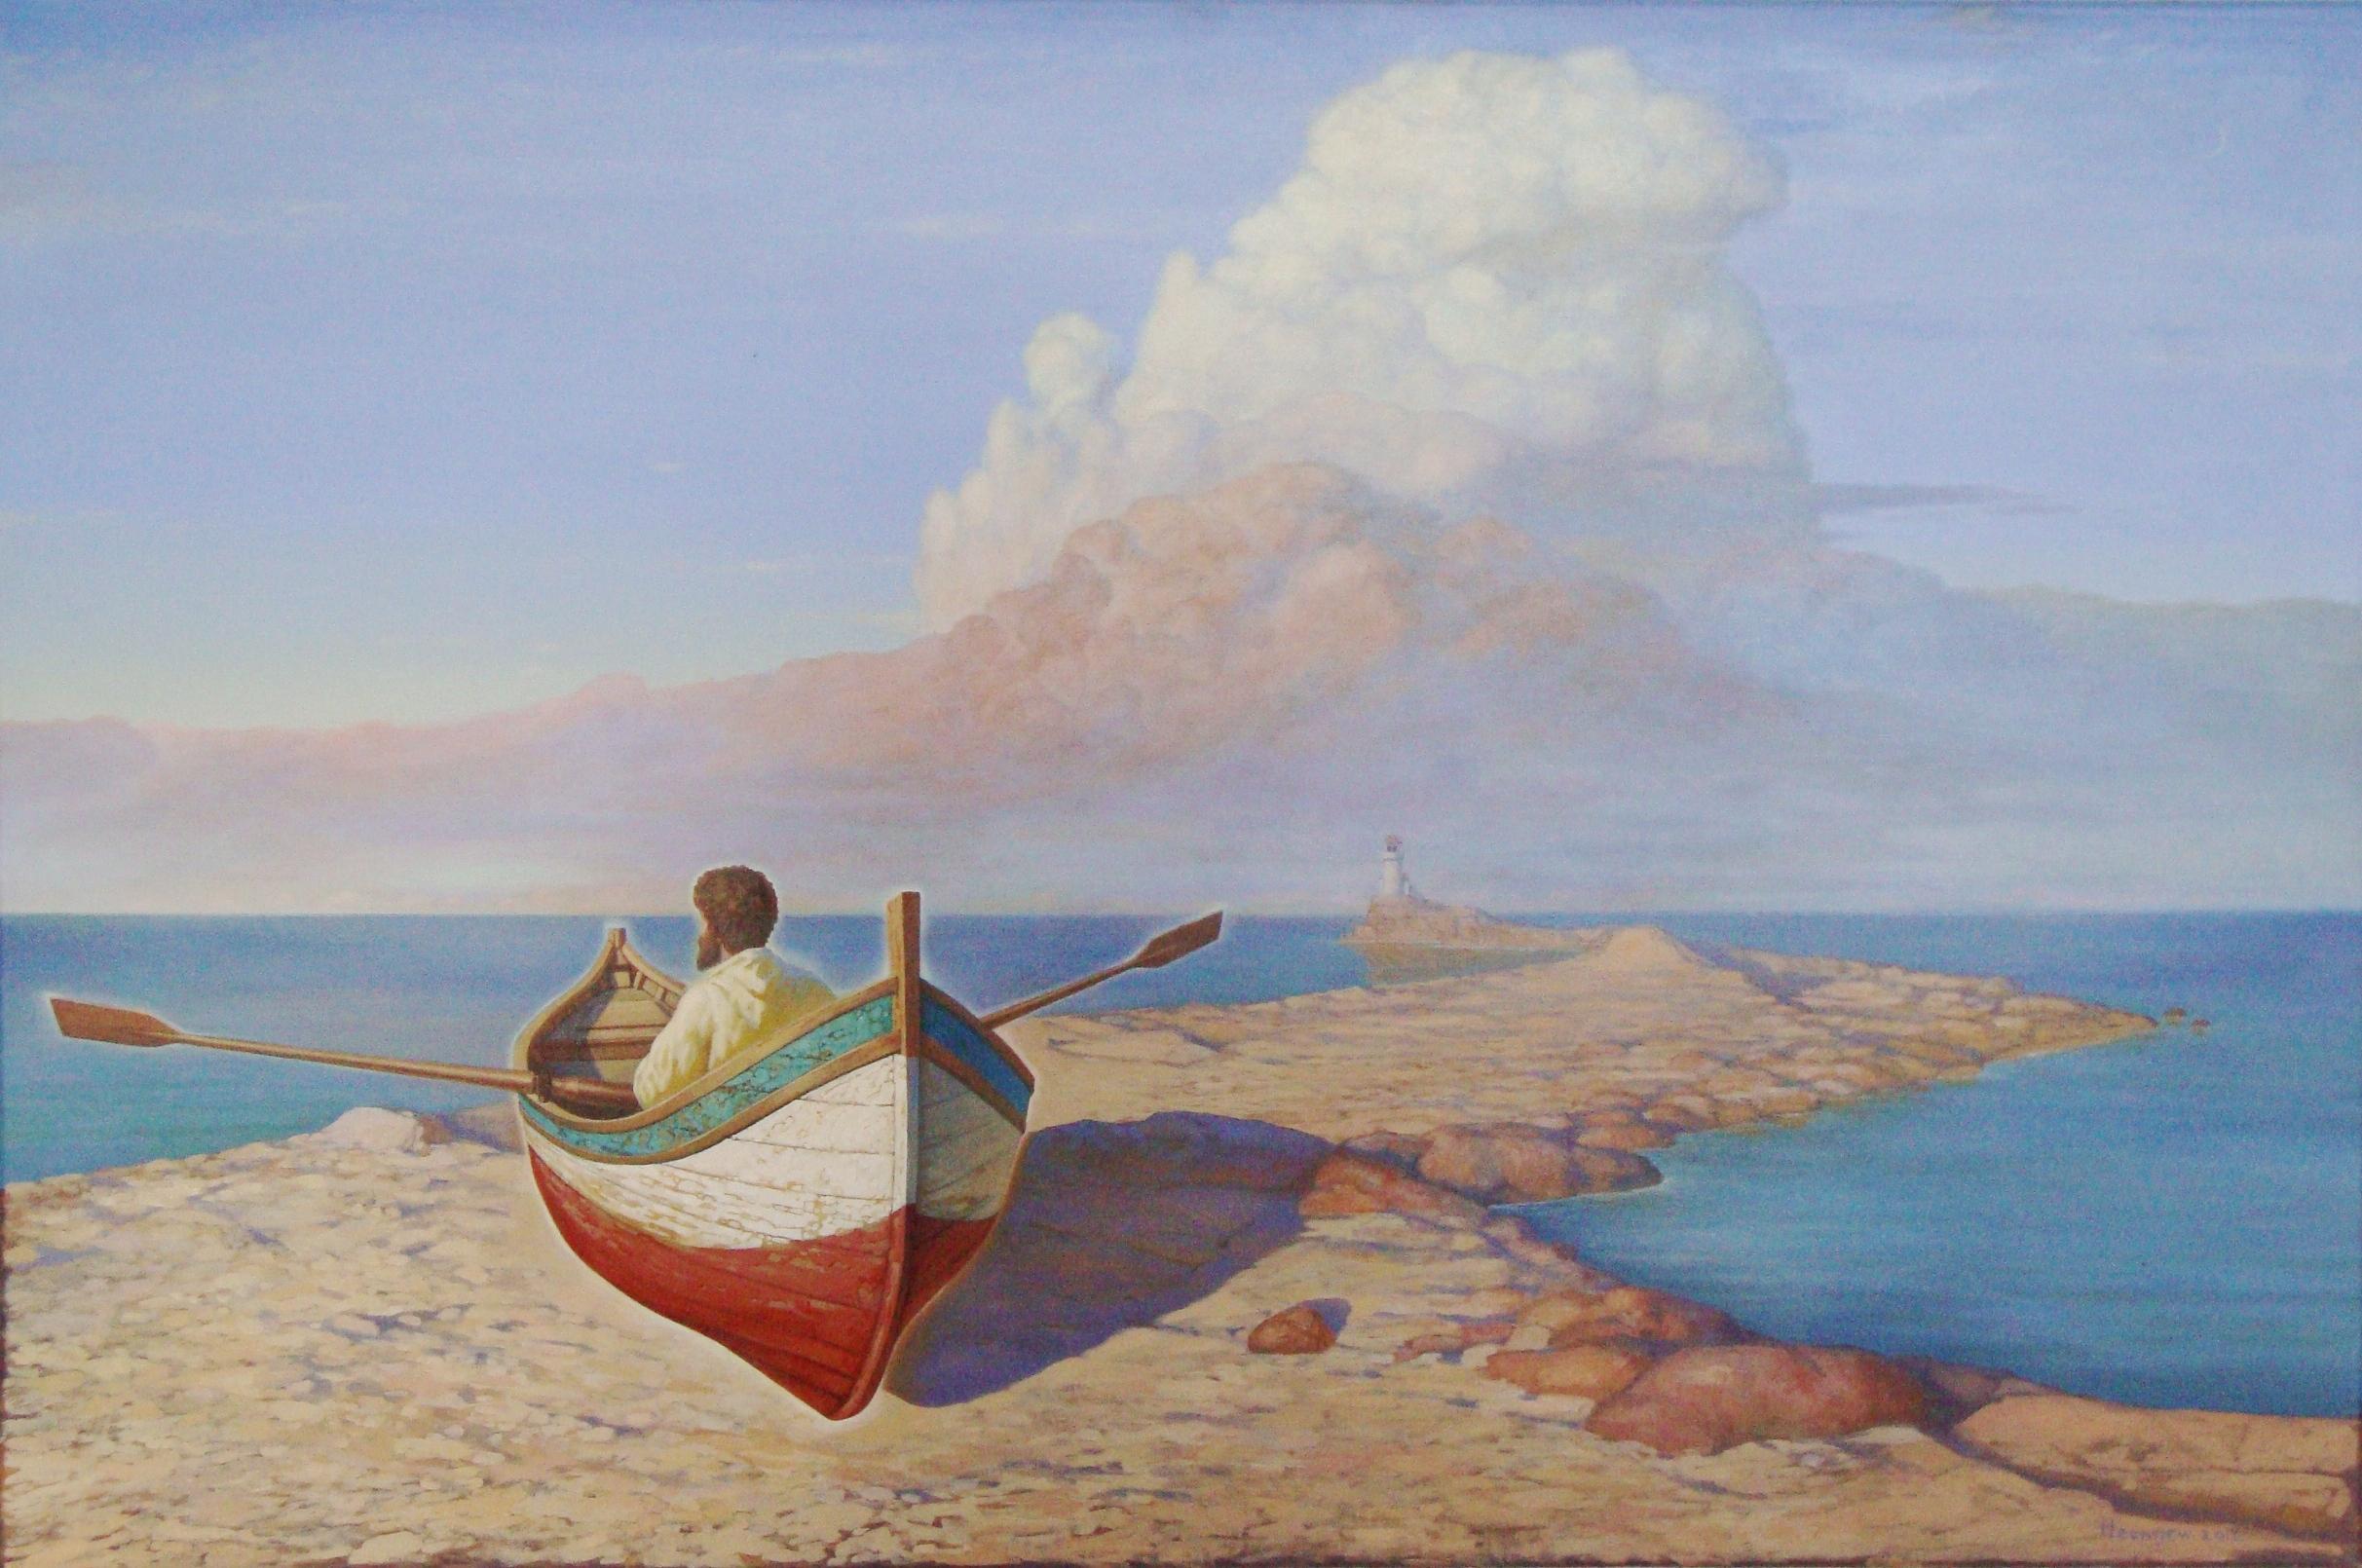 Stroll. 2012, oil on canvas, 80x120 cm